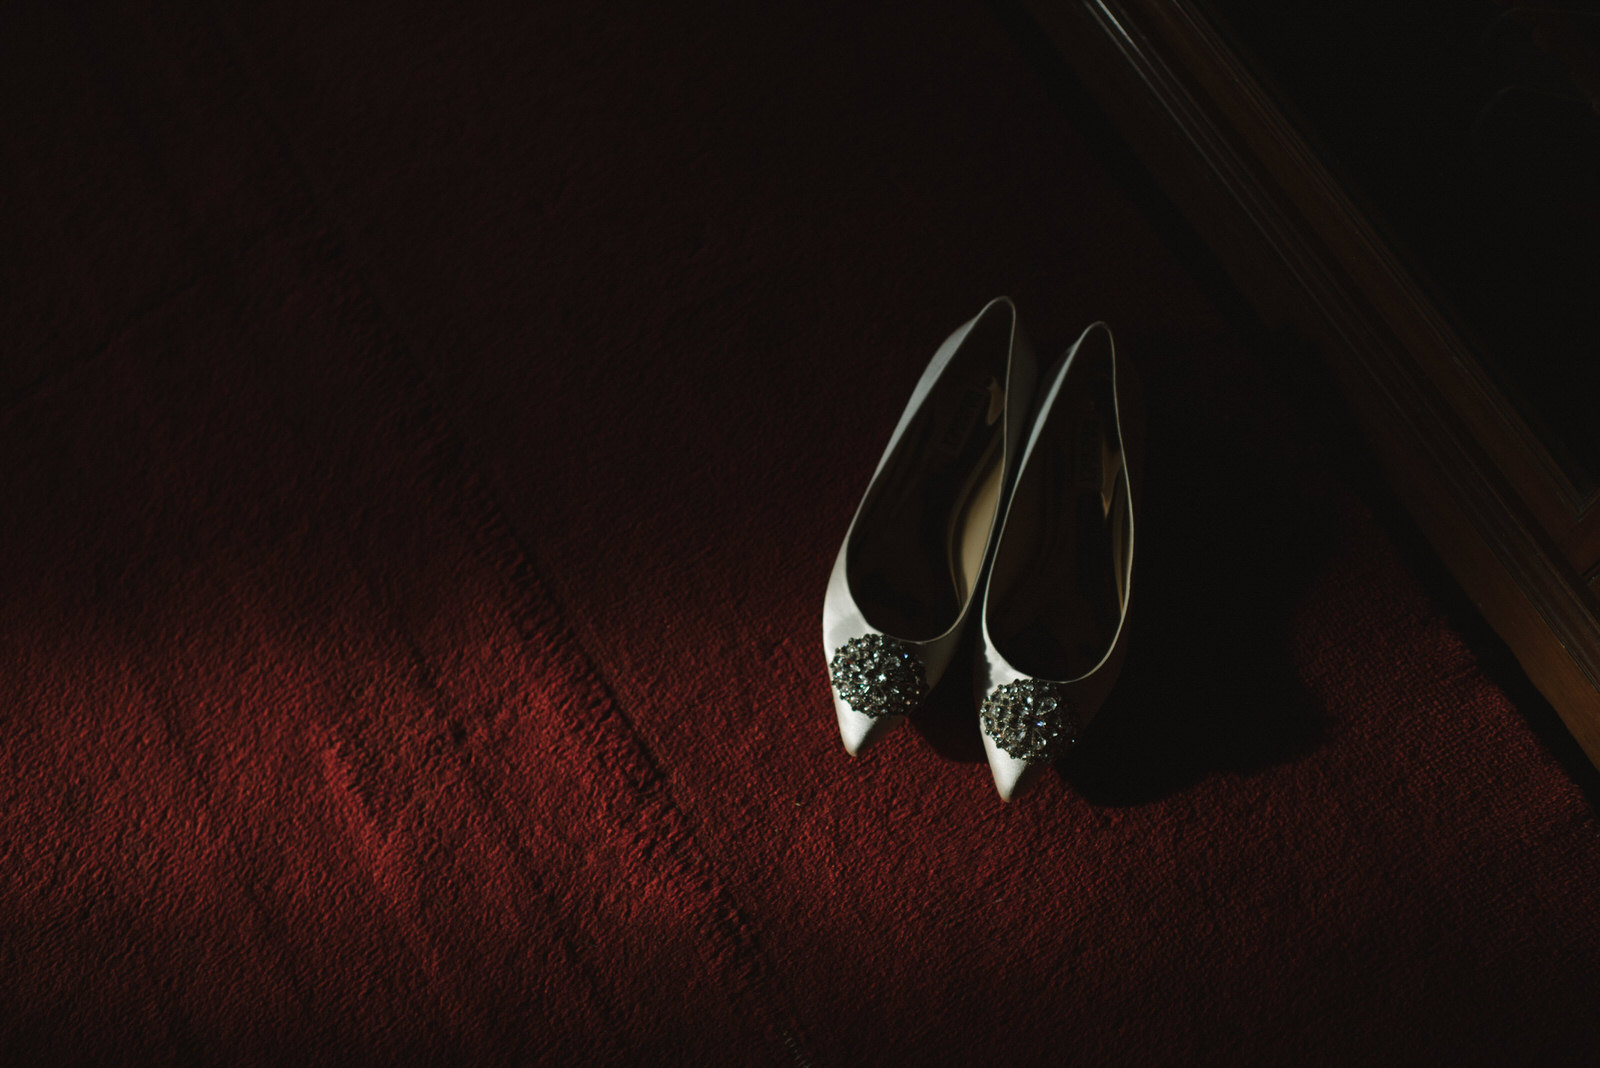 003-COLSTOUN-HOUSE-WEDDING-ALTERNATIVE-WEDDING-PHOTOGRAPHER-GLASGOW-WEDDING-PHOTOGRAPHER-STYLISH-SCOTTISH-WEDDING.JPG